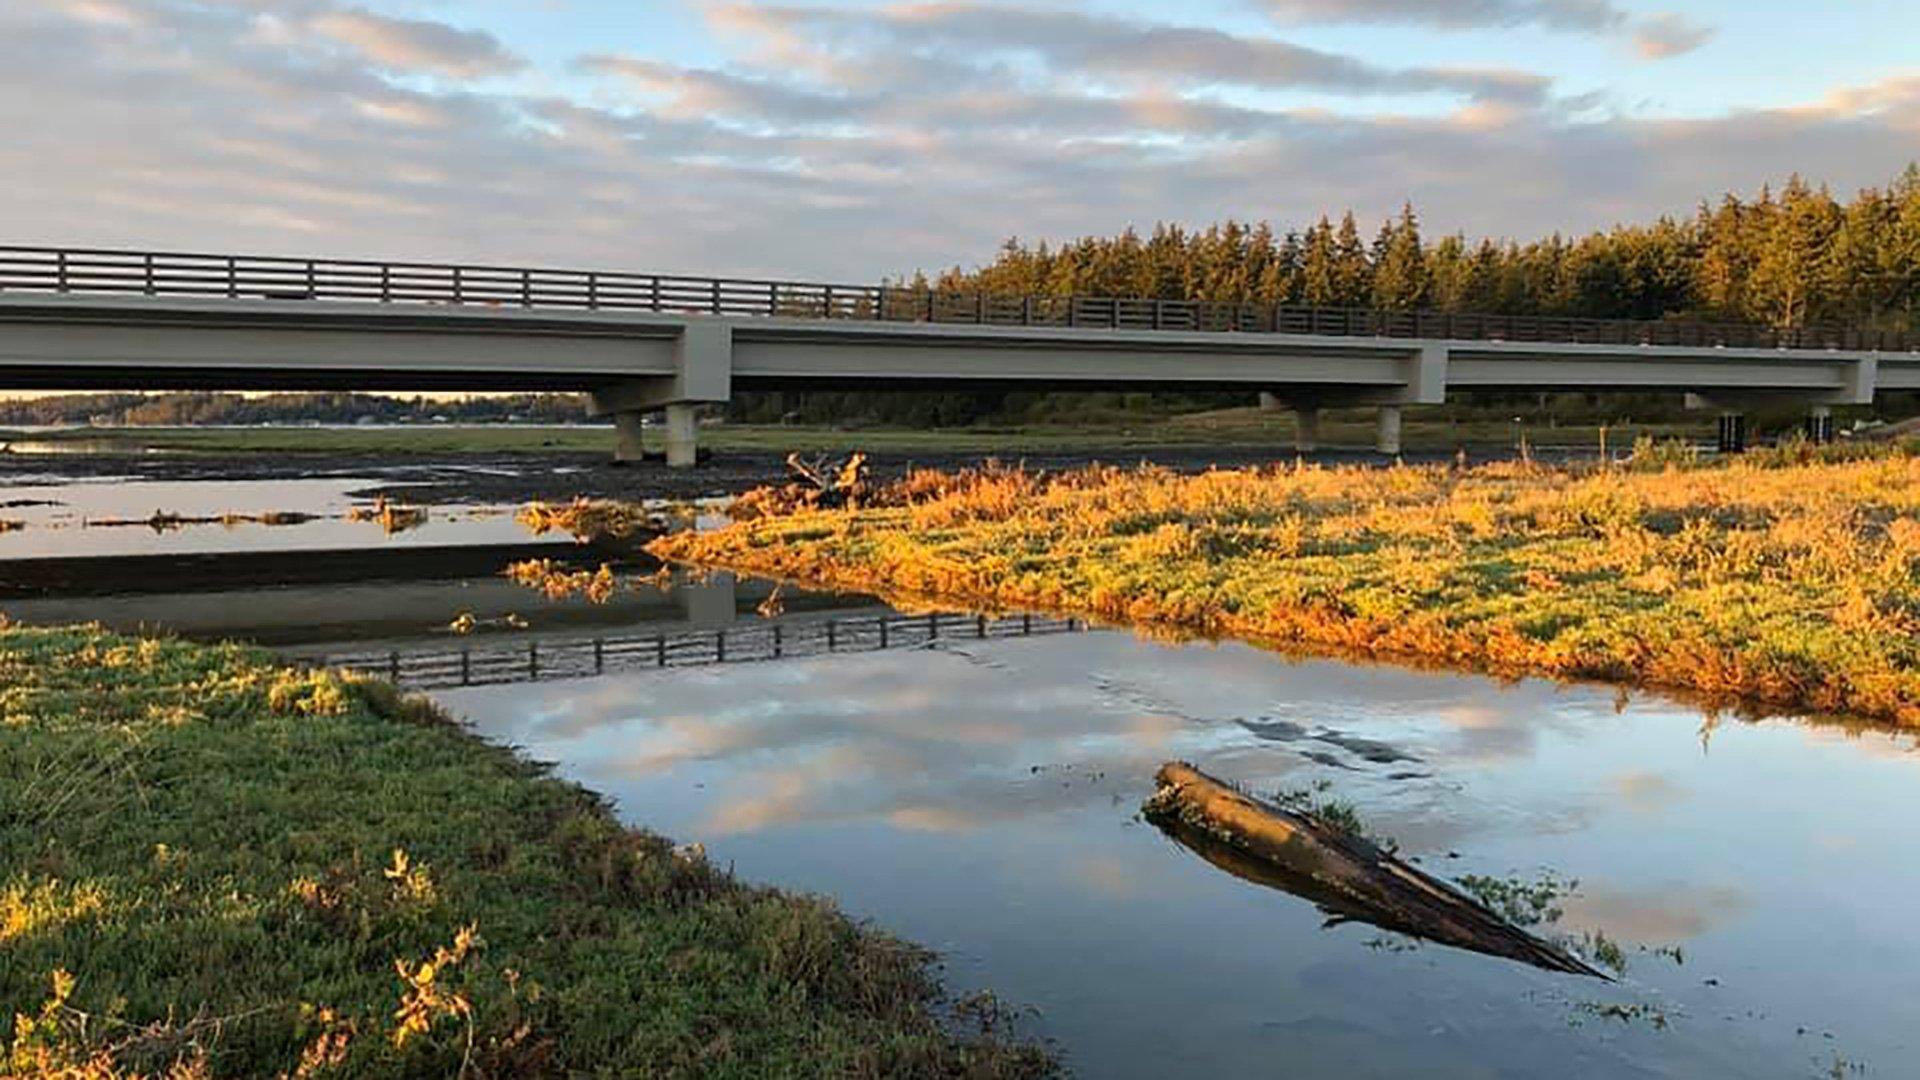 Killisut Harbor Restoration Project – North Olympic Salmon Coalition